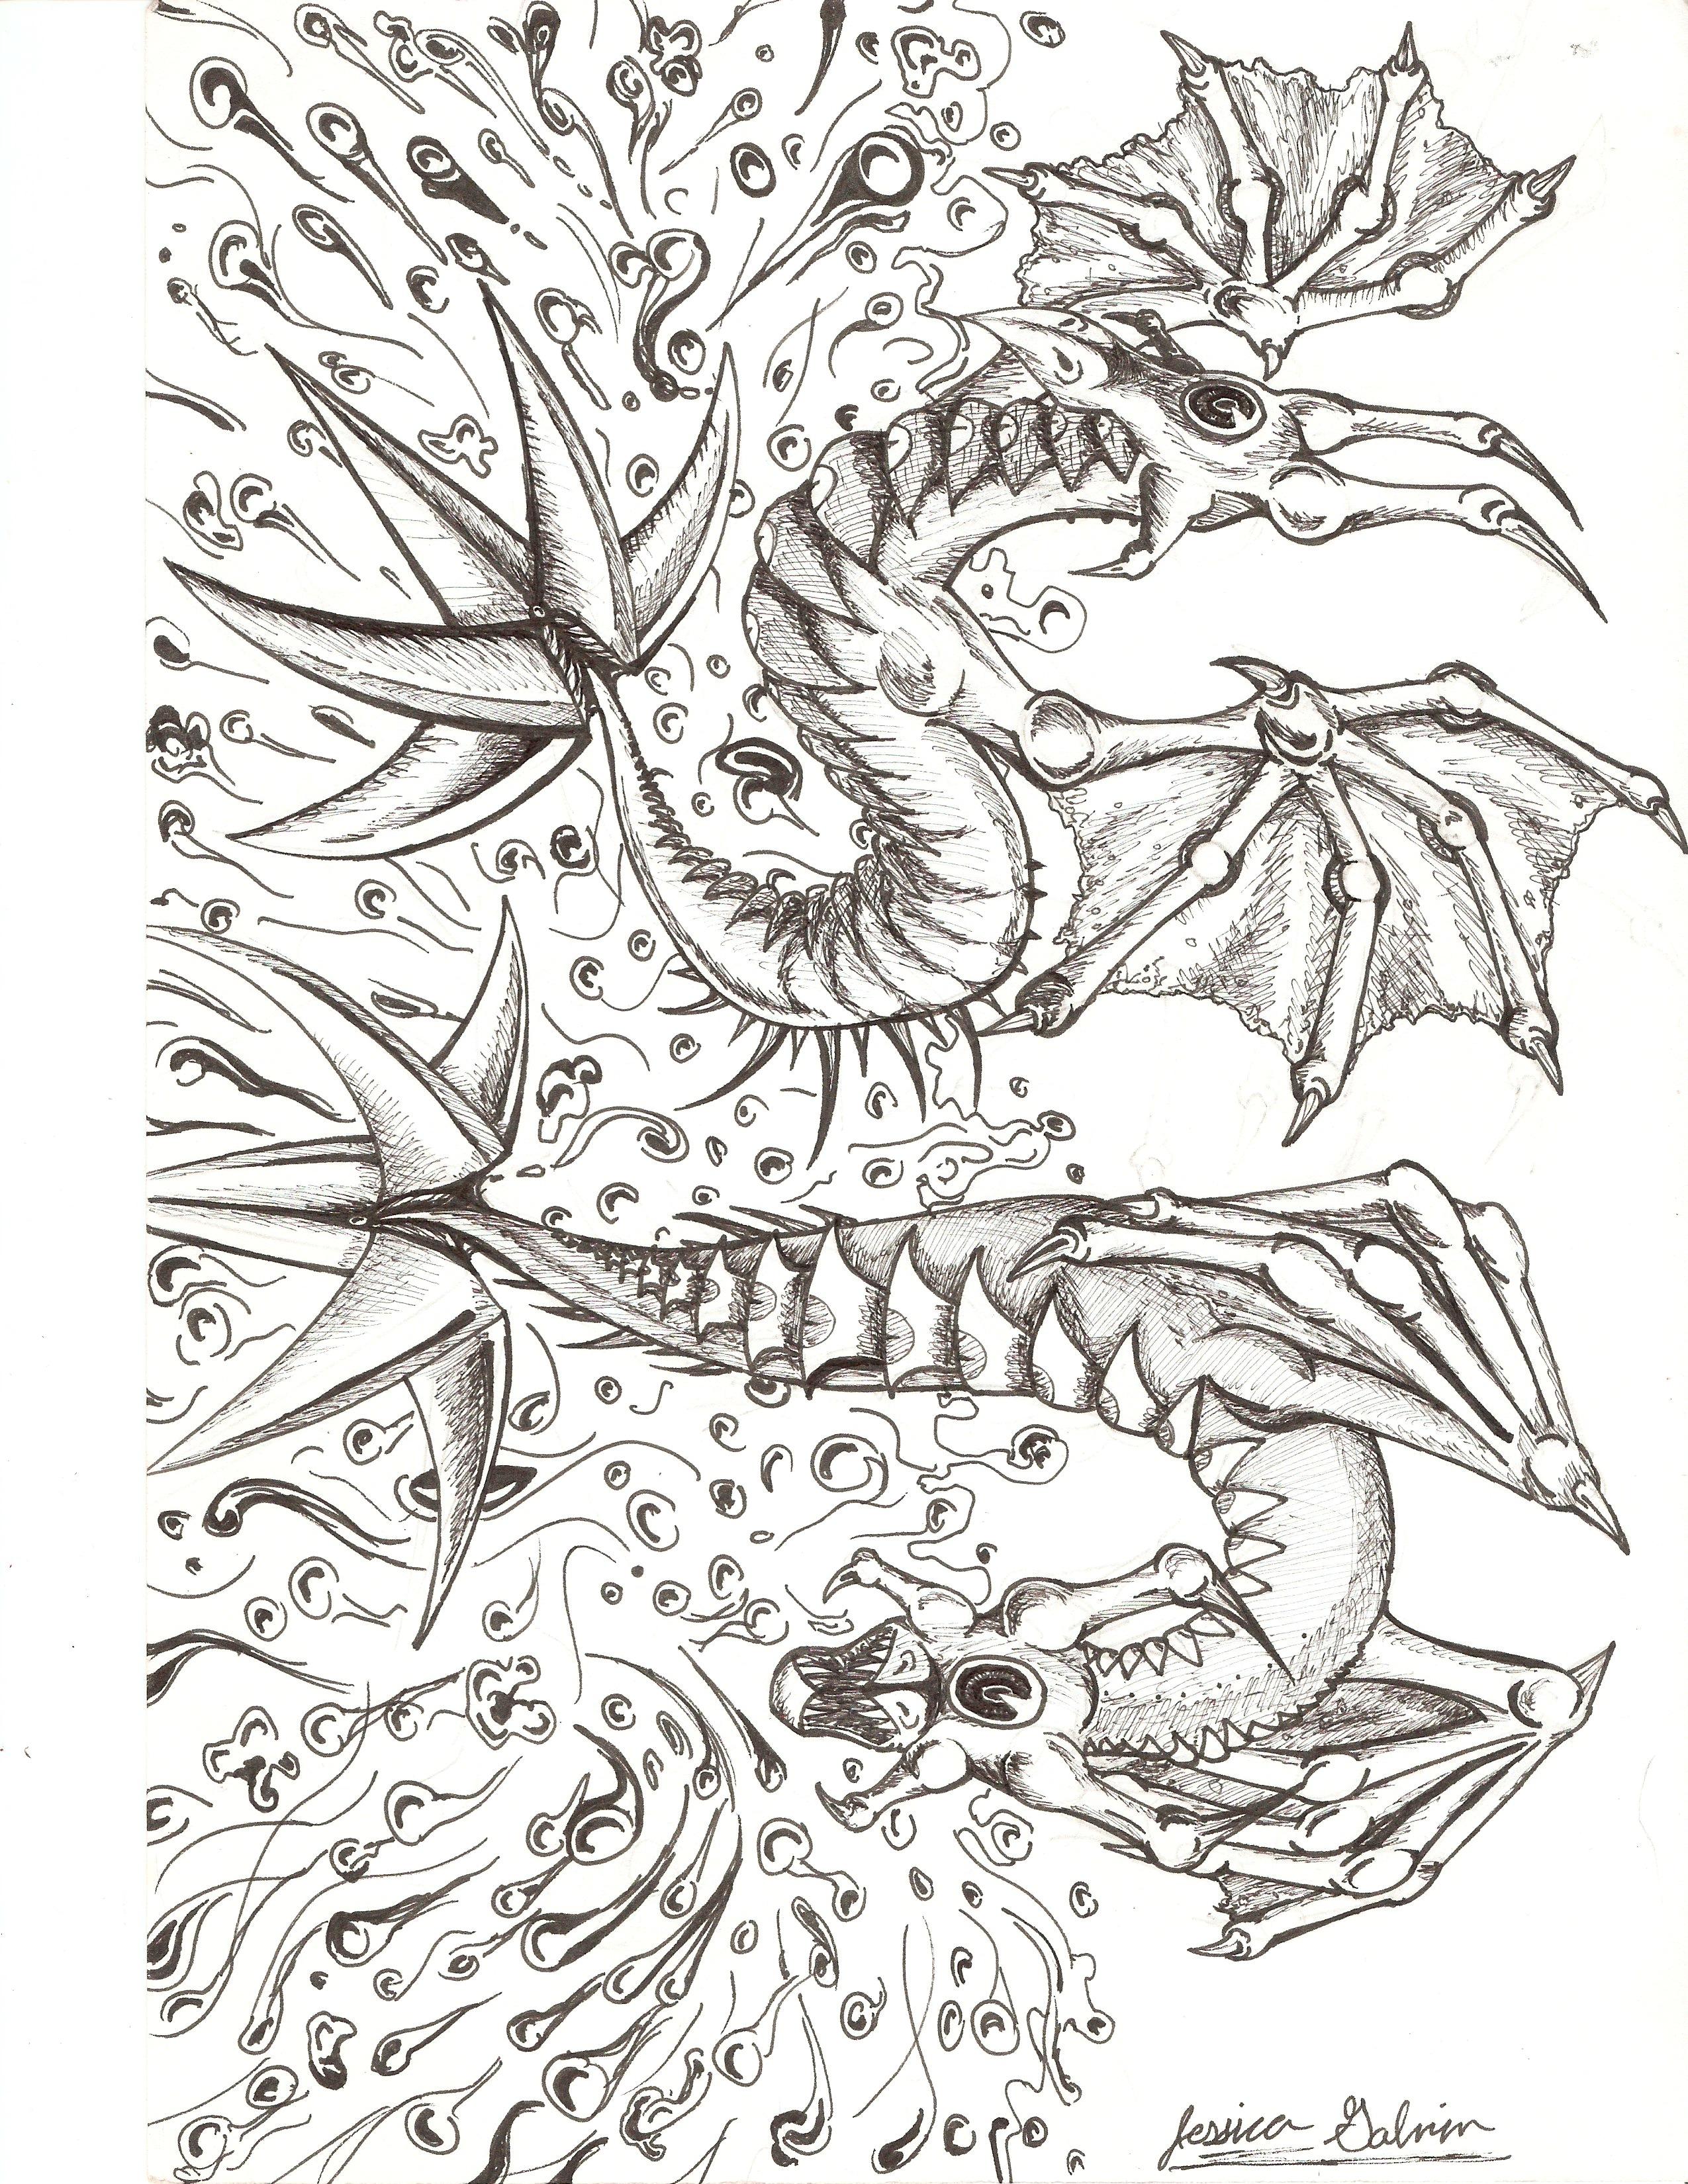 Water Serpents